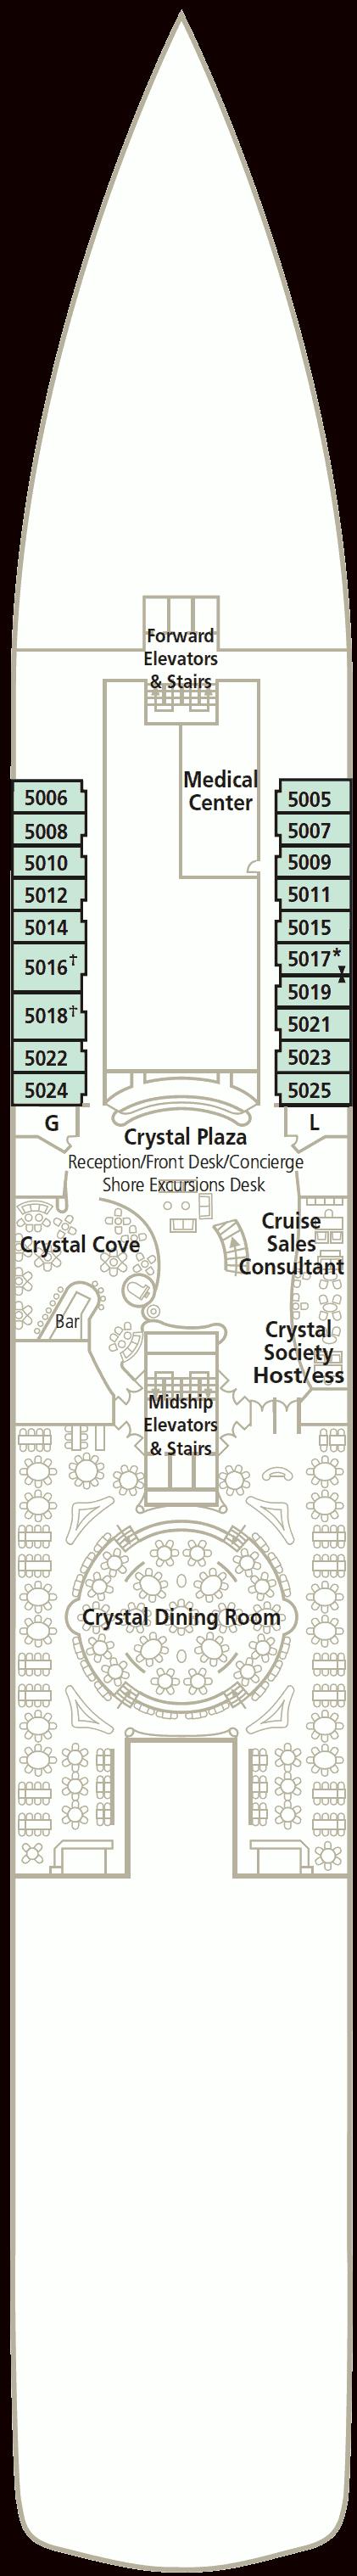 Crystal Symphony Crystal